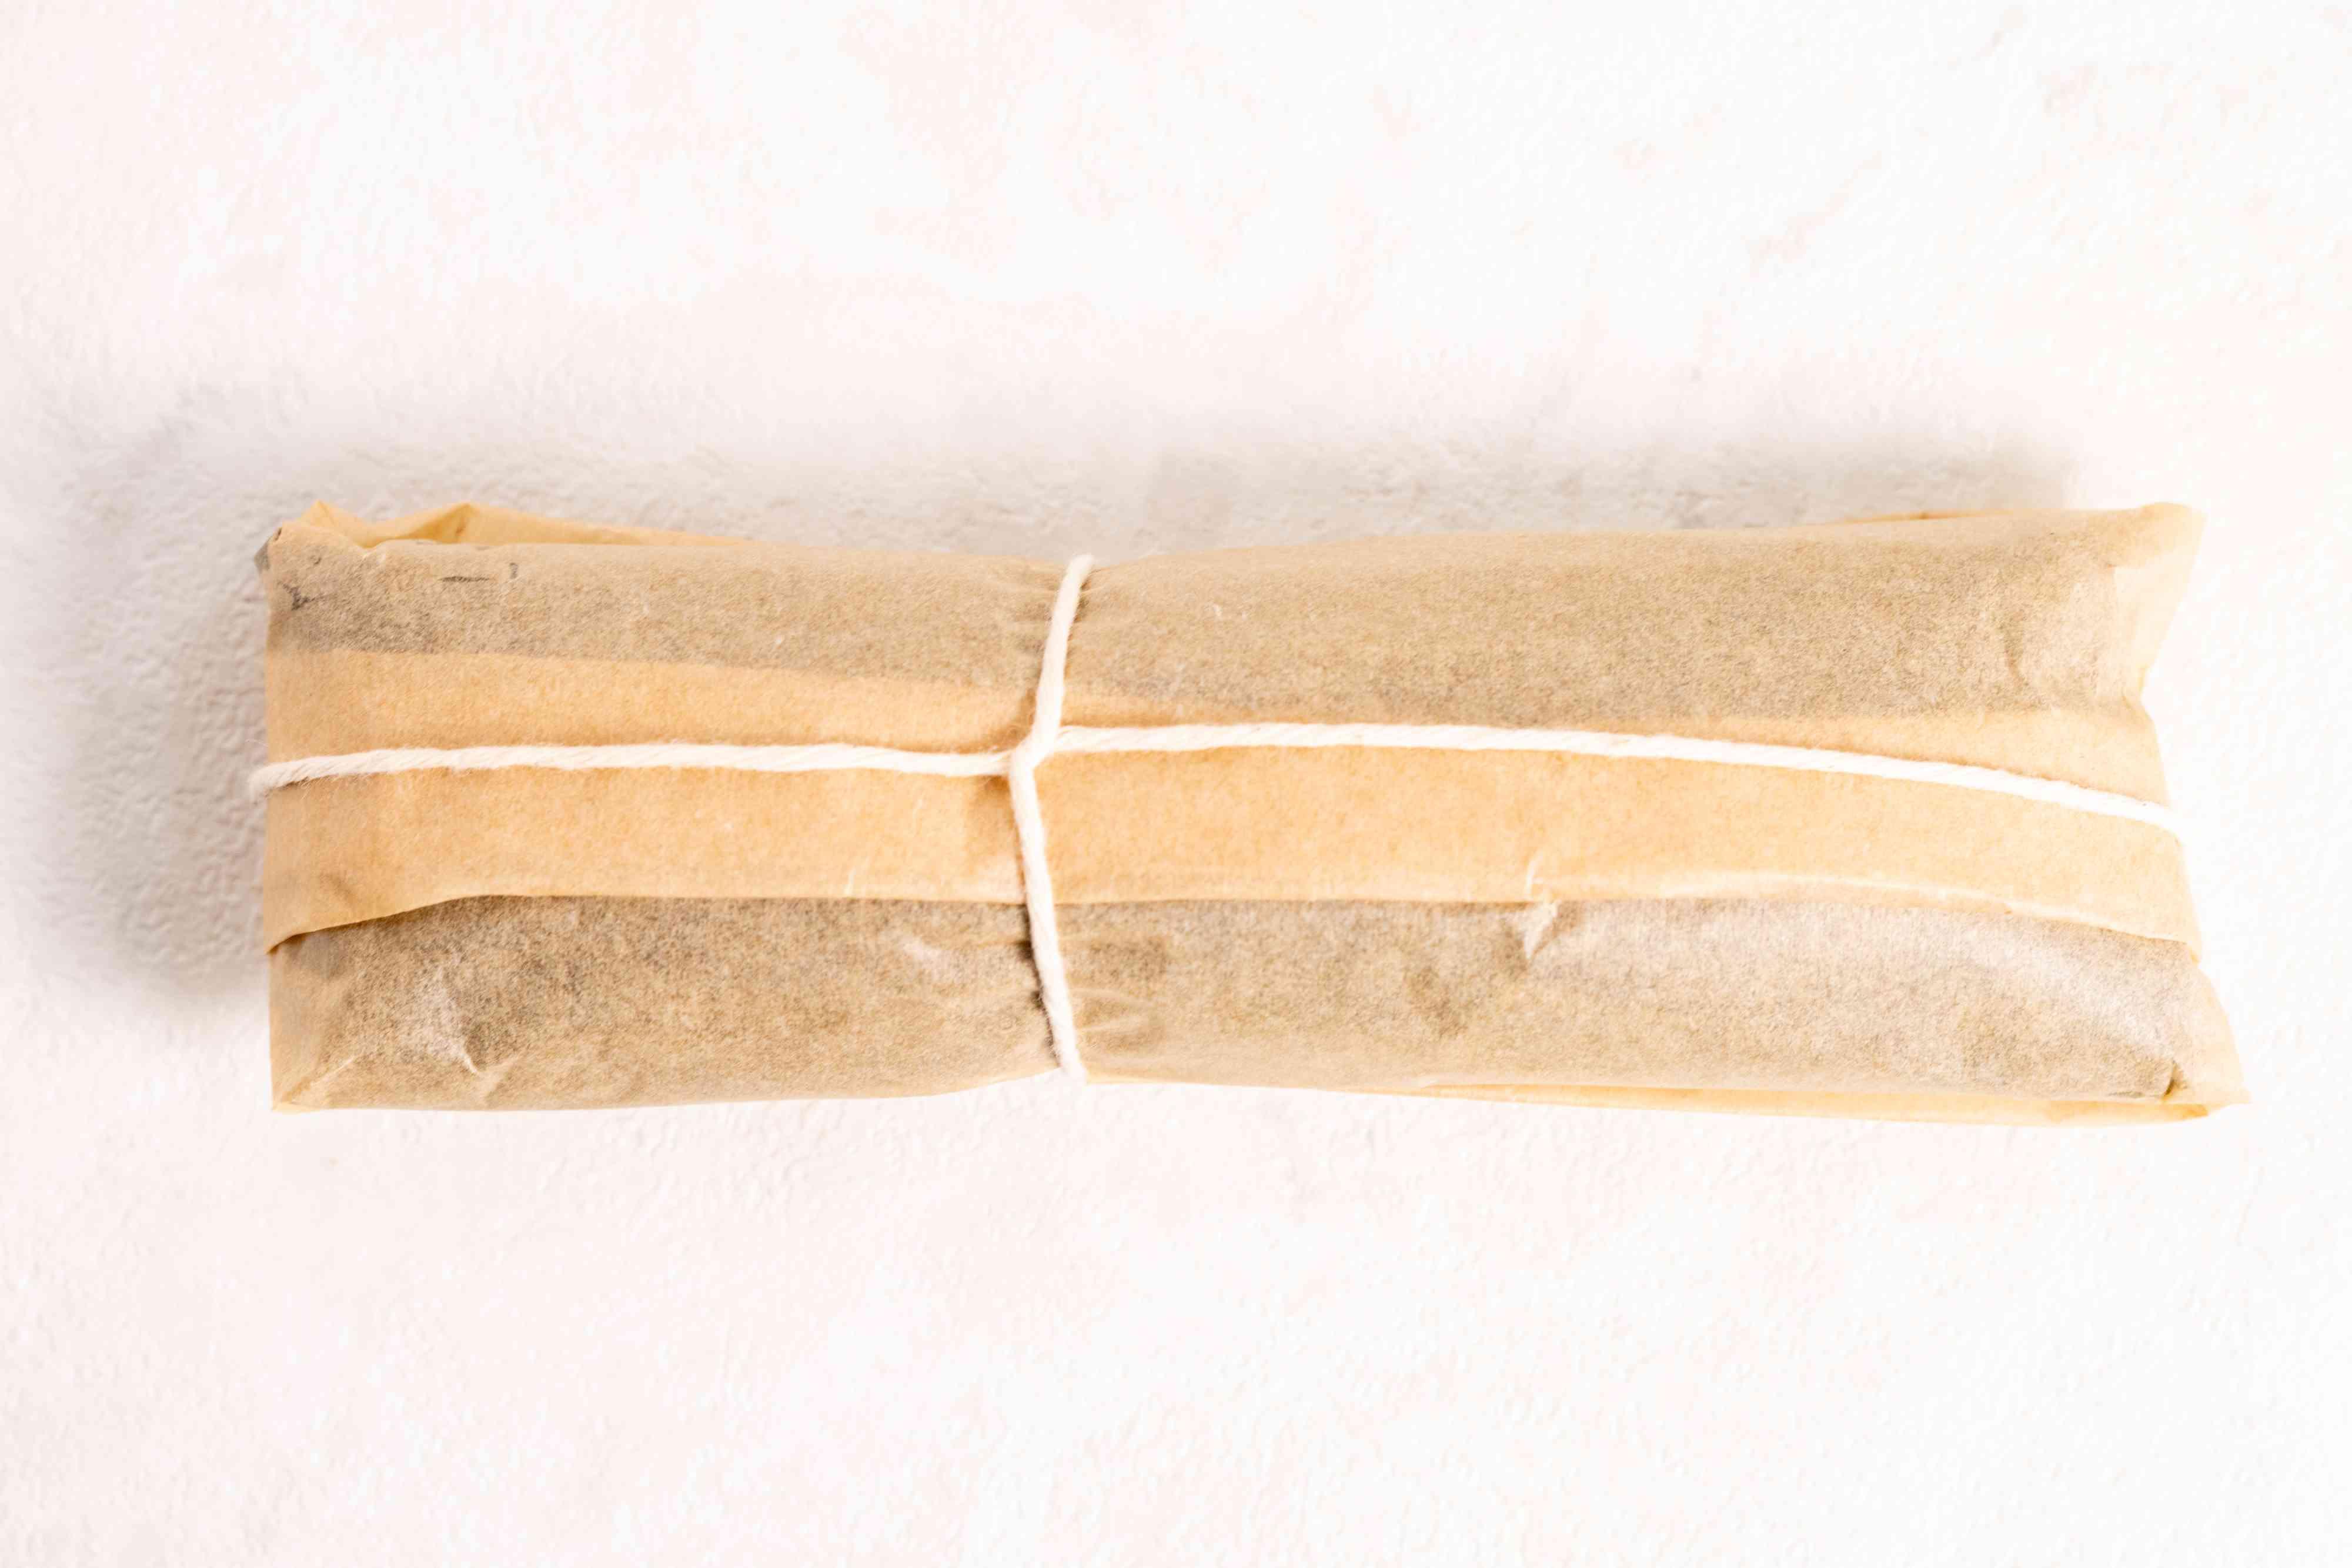 tie string around the parchment paper